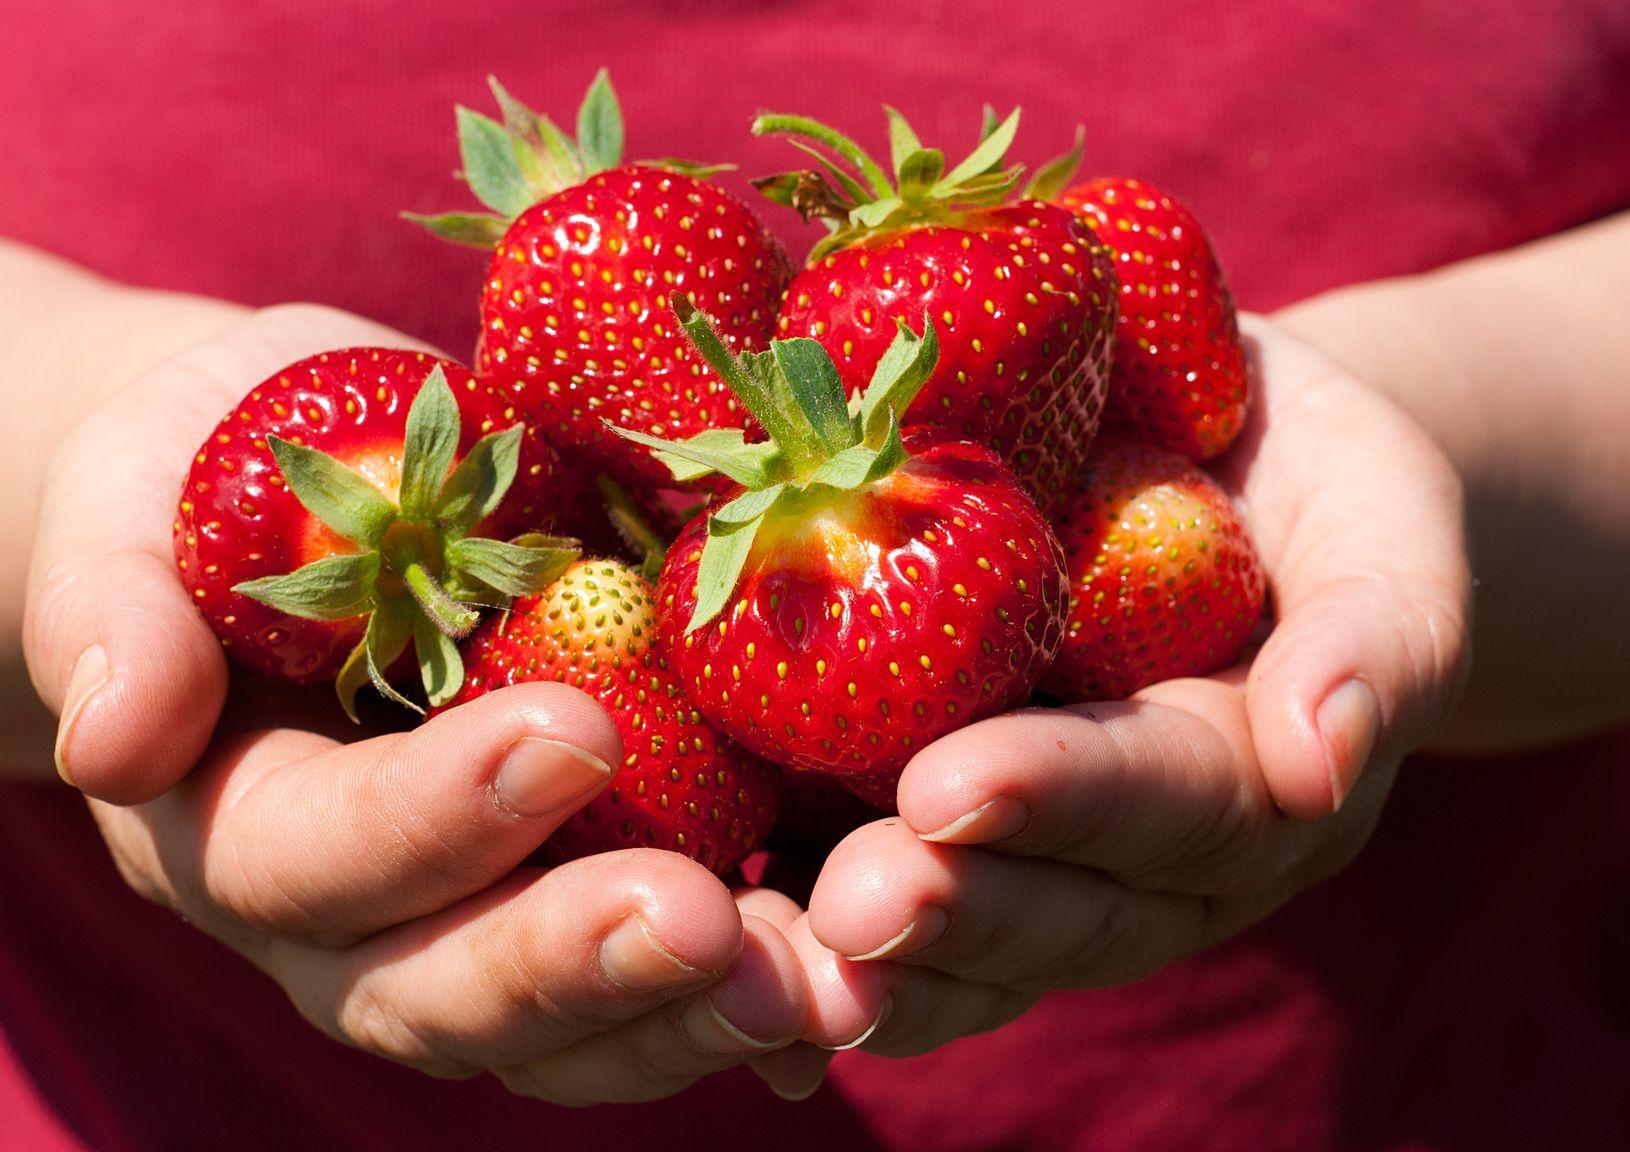 Strawberries. https://www.info-on-high-blood-pressure.com/chronic-inflammation.html